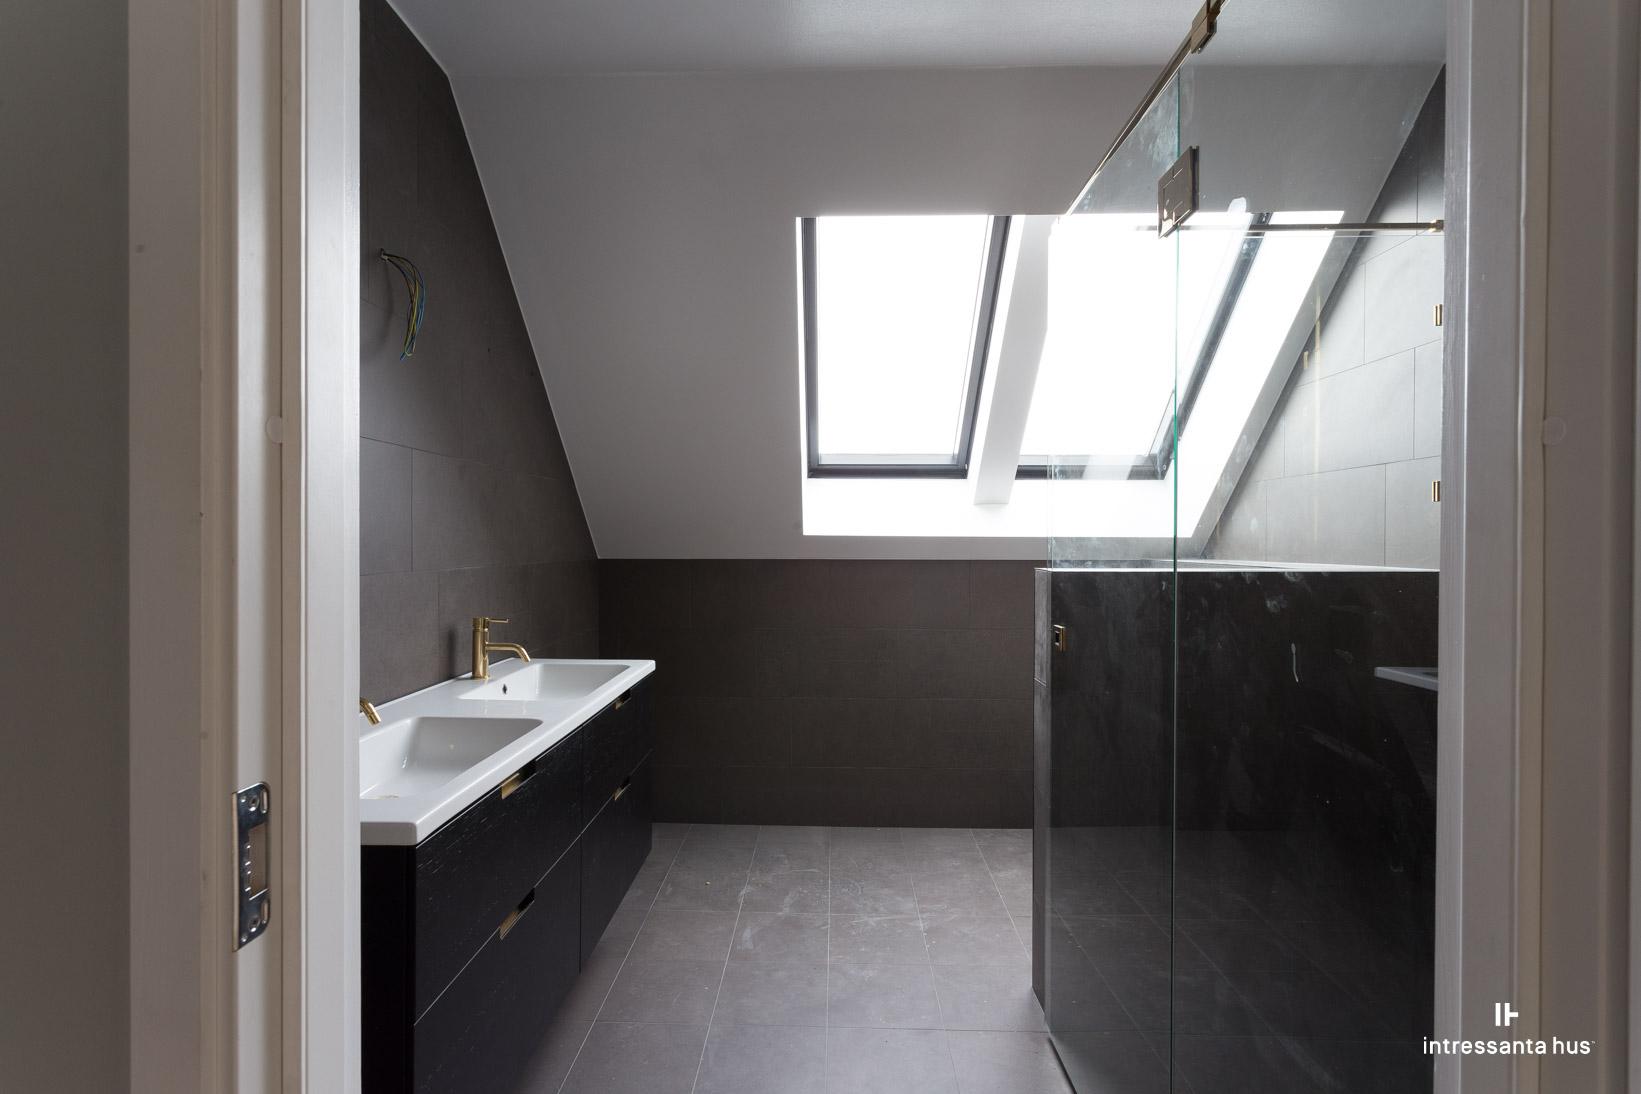 intressantahus-house1-085